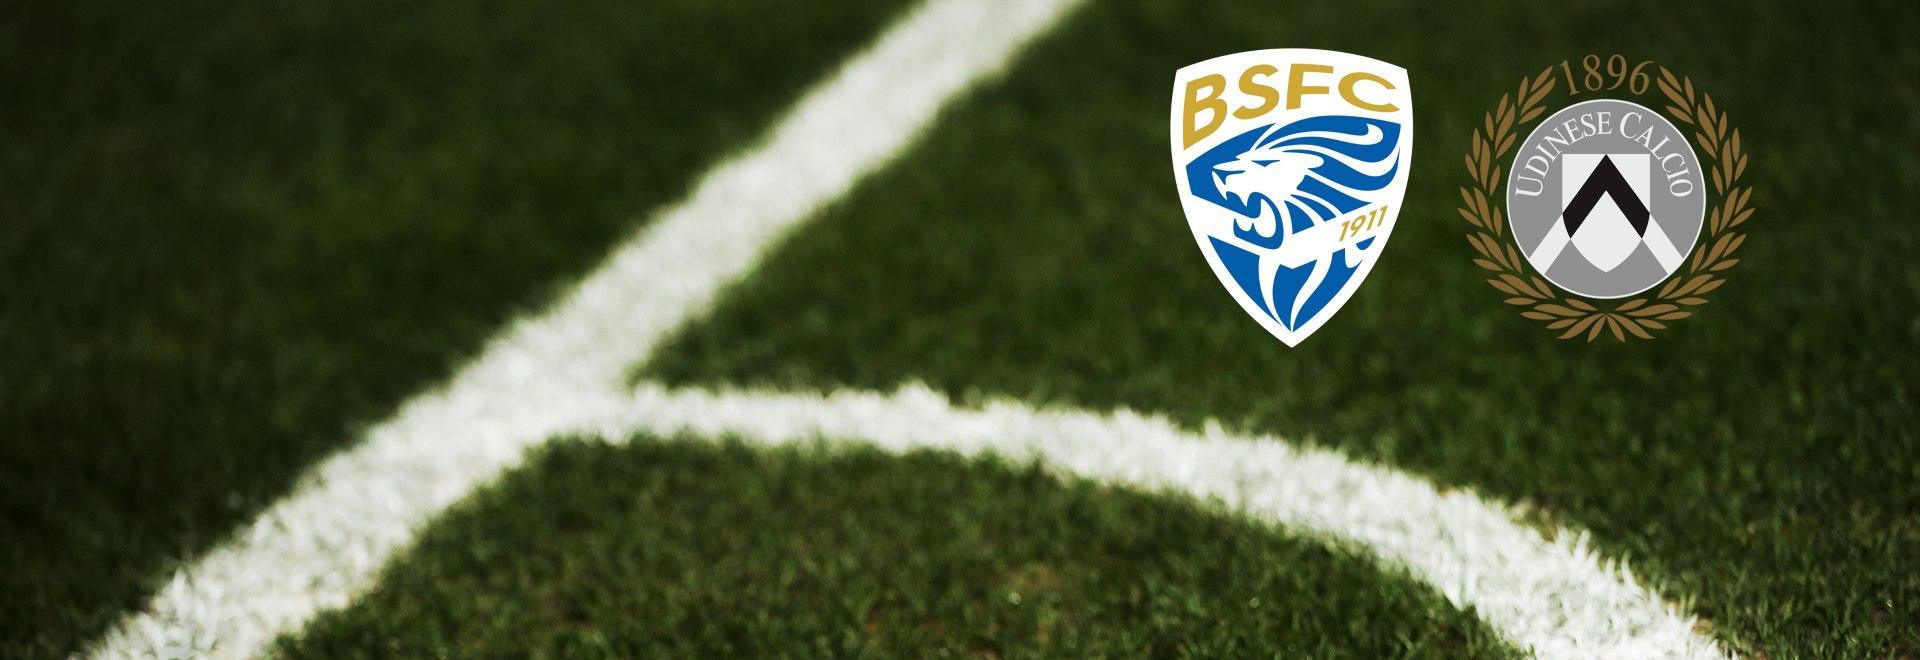 Brescia - Udinese. 23a g.